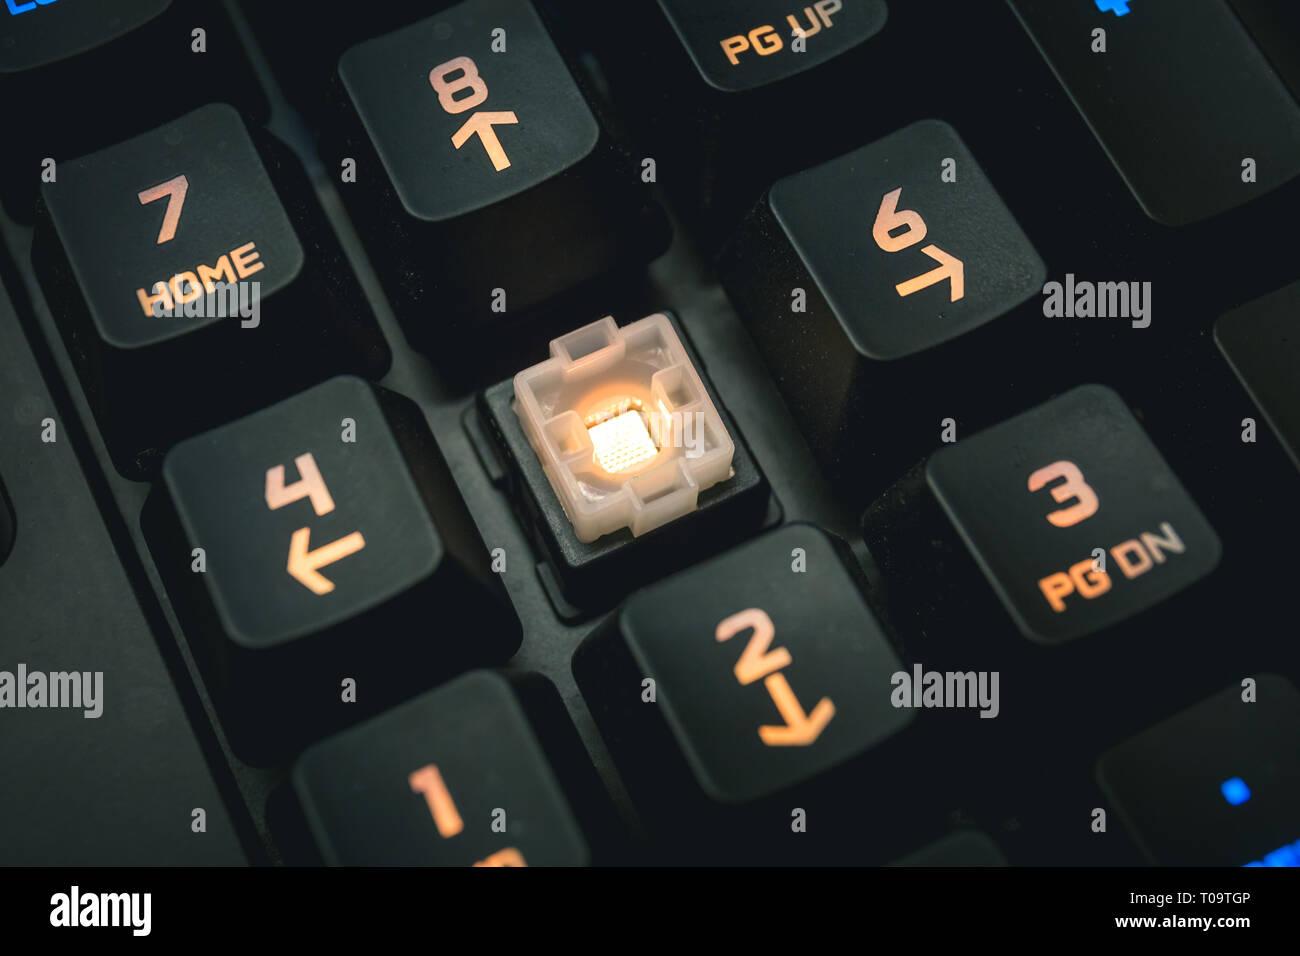 Backlit mechanical keyboard numerical buttons detail shot. - Stock Image